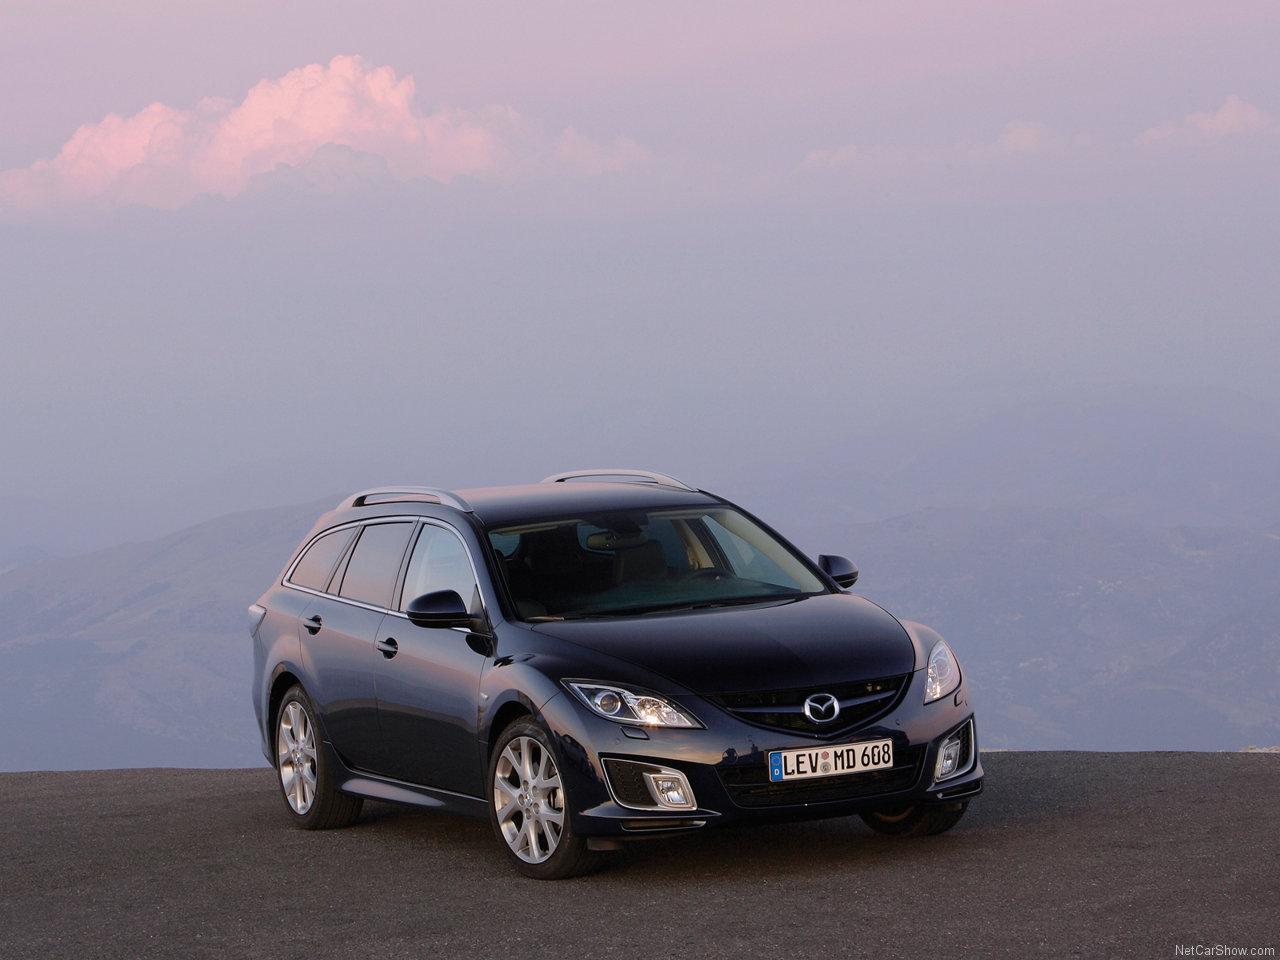 2009 Mazda 6 Sap (50 Images) - New HD Car Wallpaper